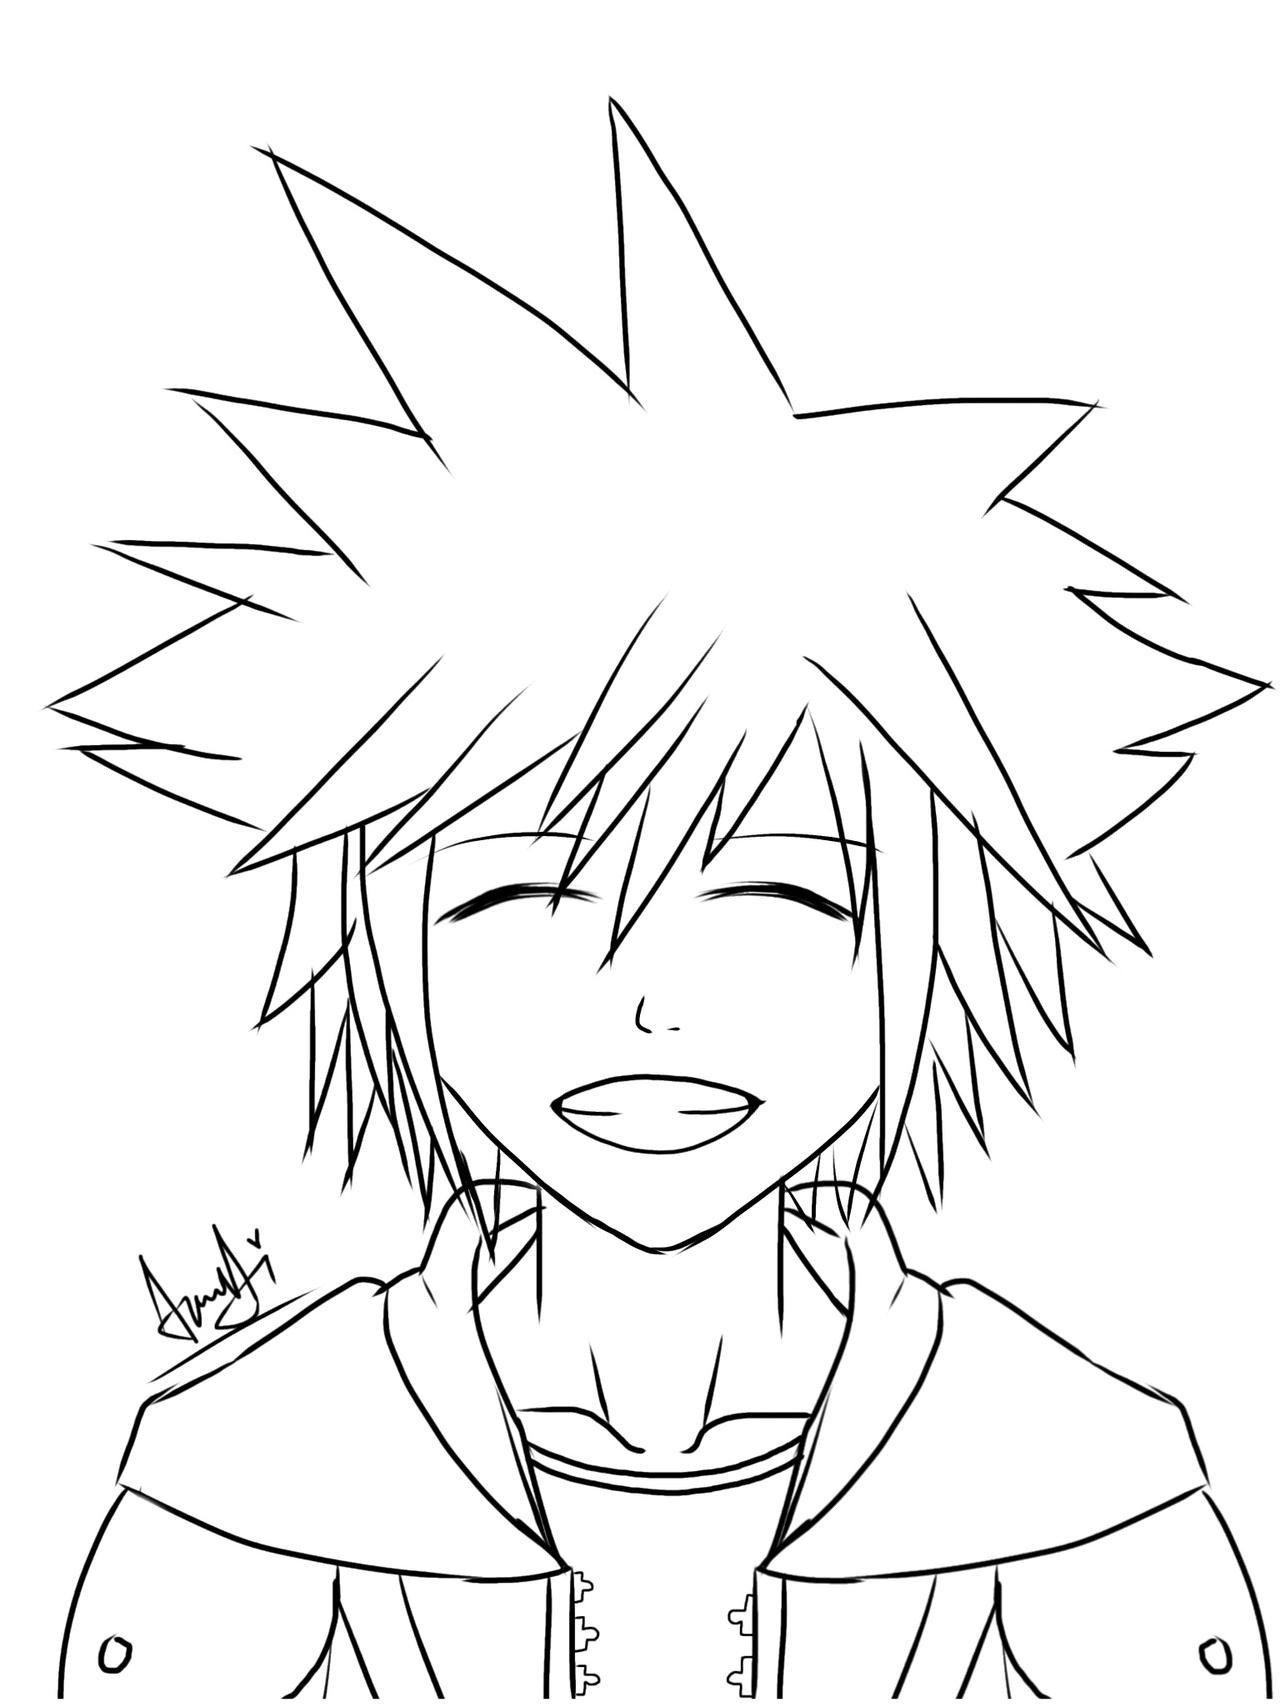 Sora Kingdom Hearts Lineart : Sora kingdom hearts lineart by christyhana on deviantart